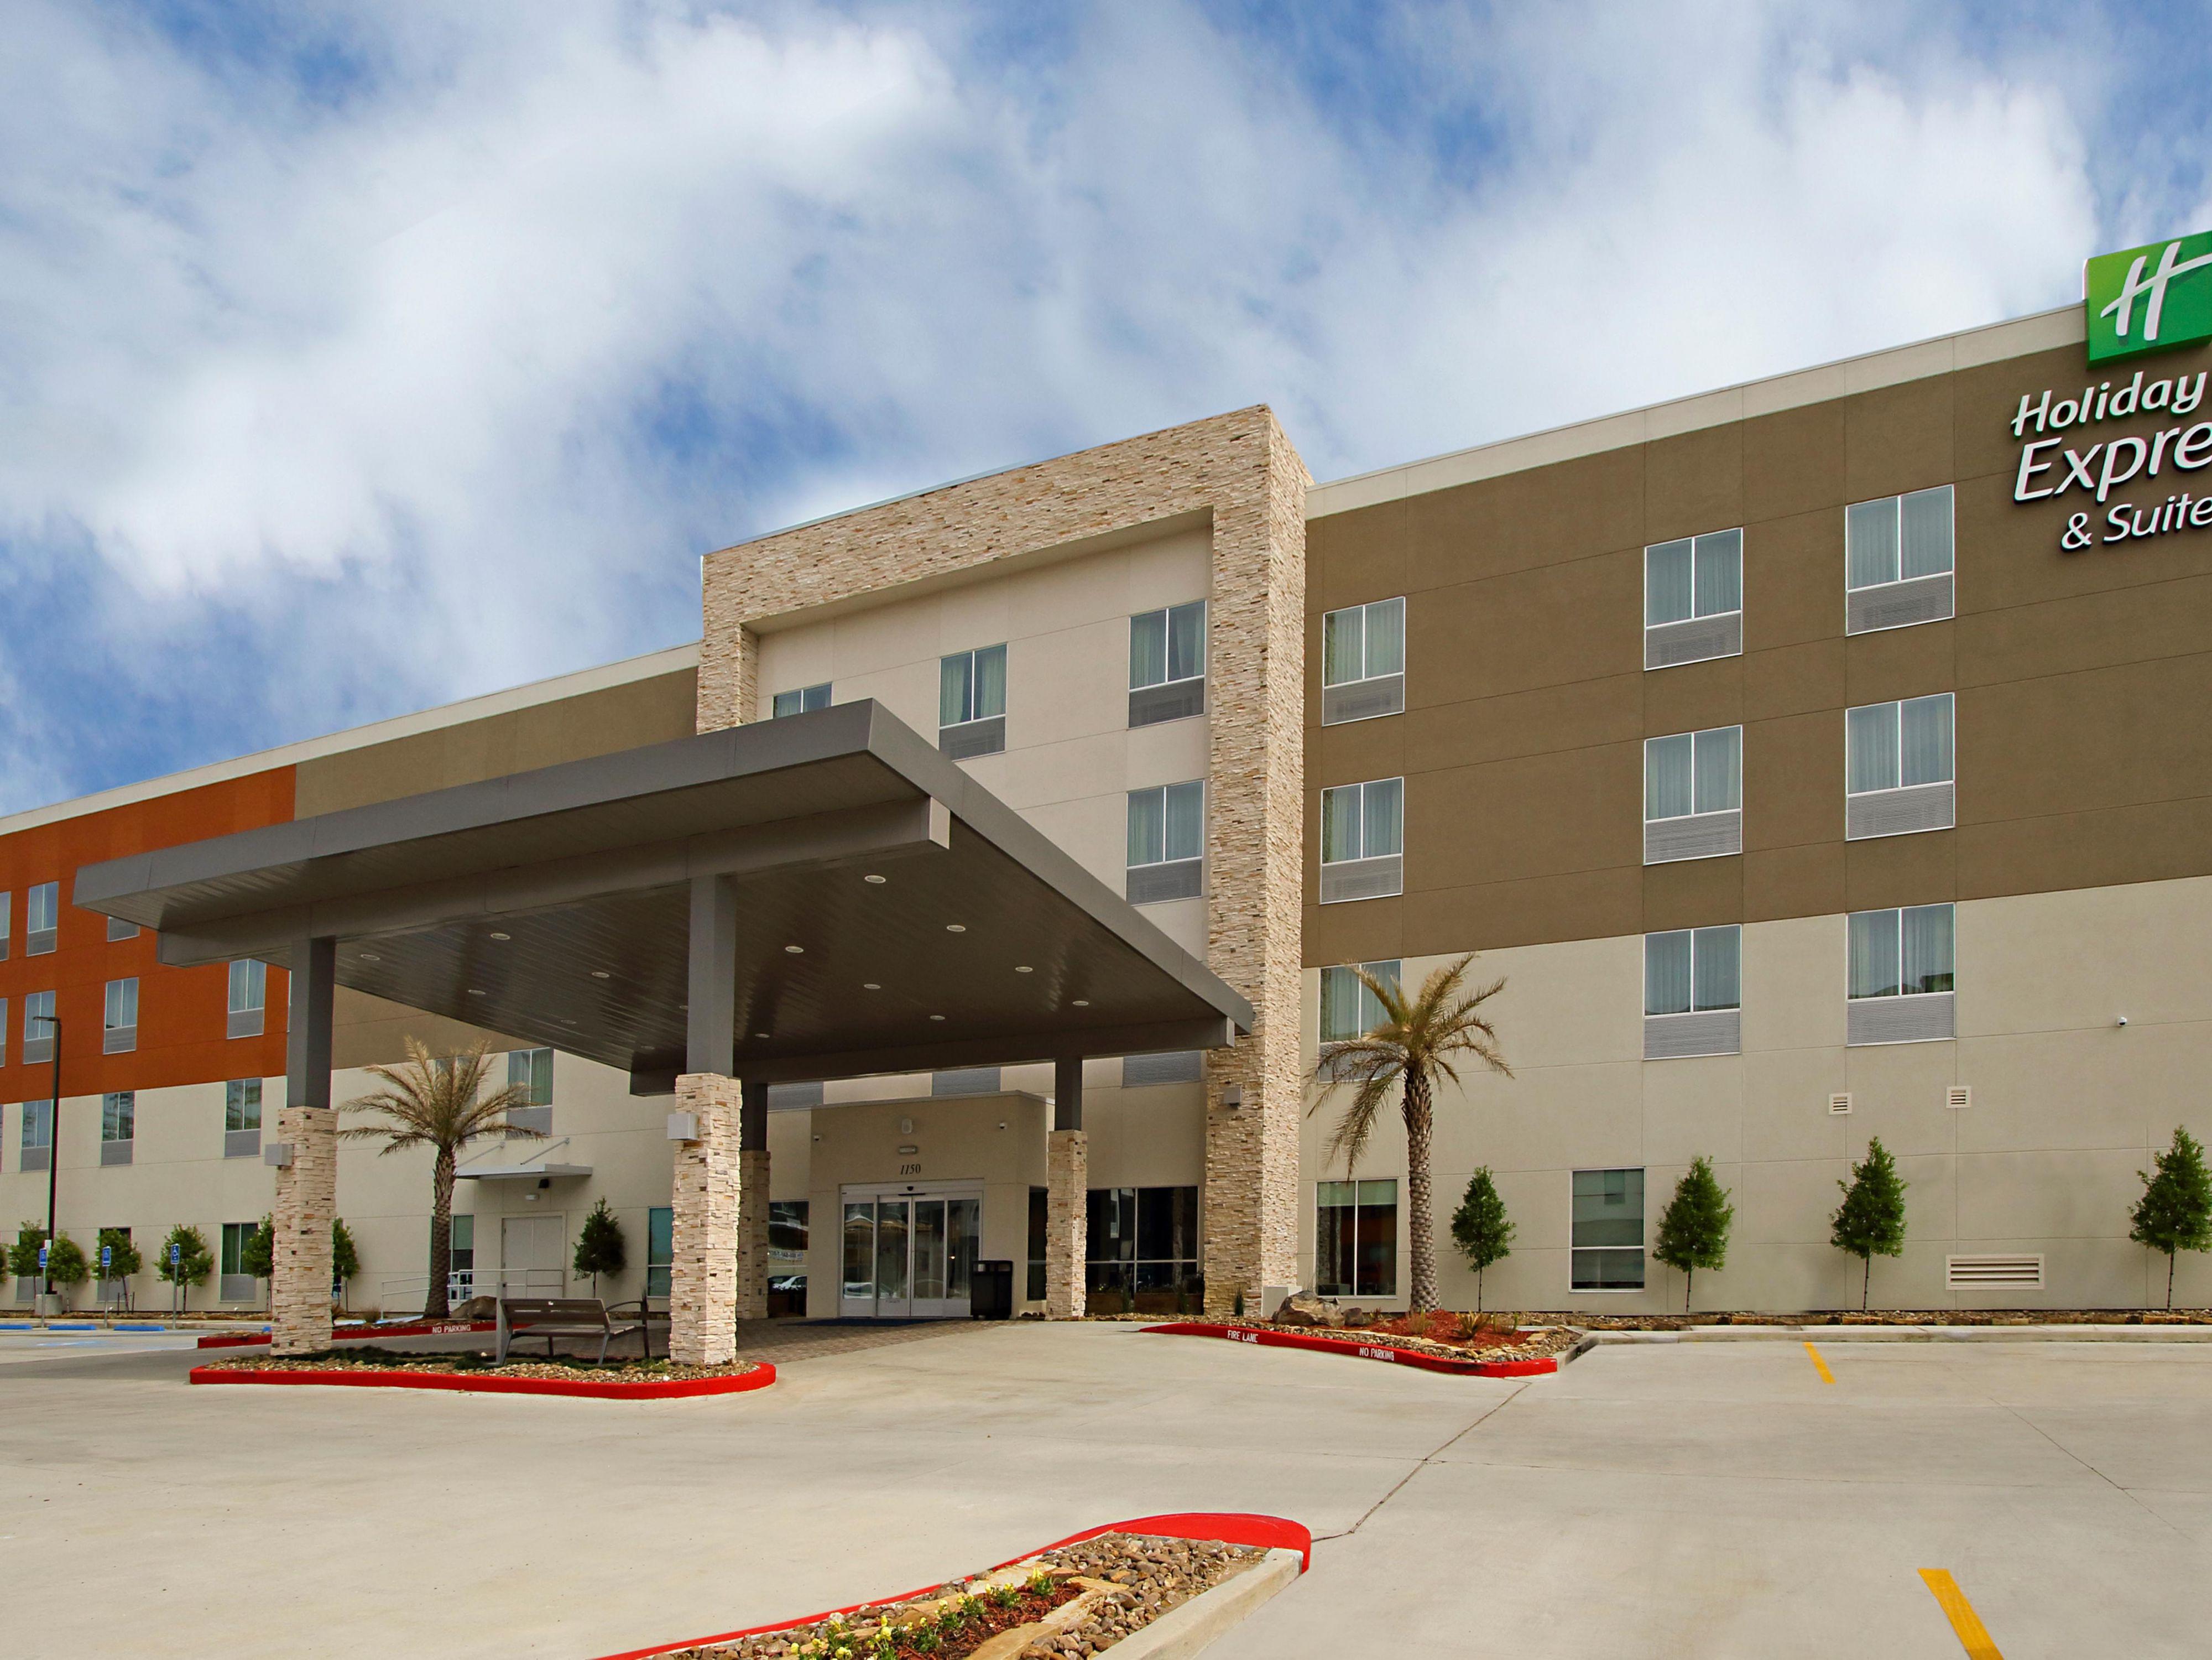 Holiday Inn Express California Locations Map Reference Holiday Inn - Map Of Holiday Inn Express Locations In California